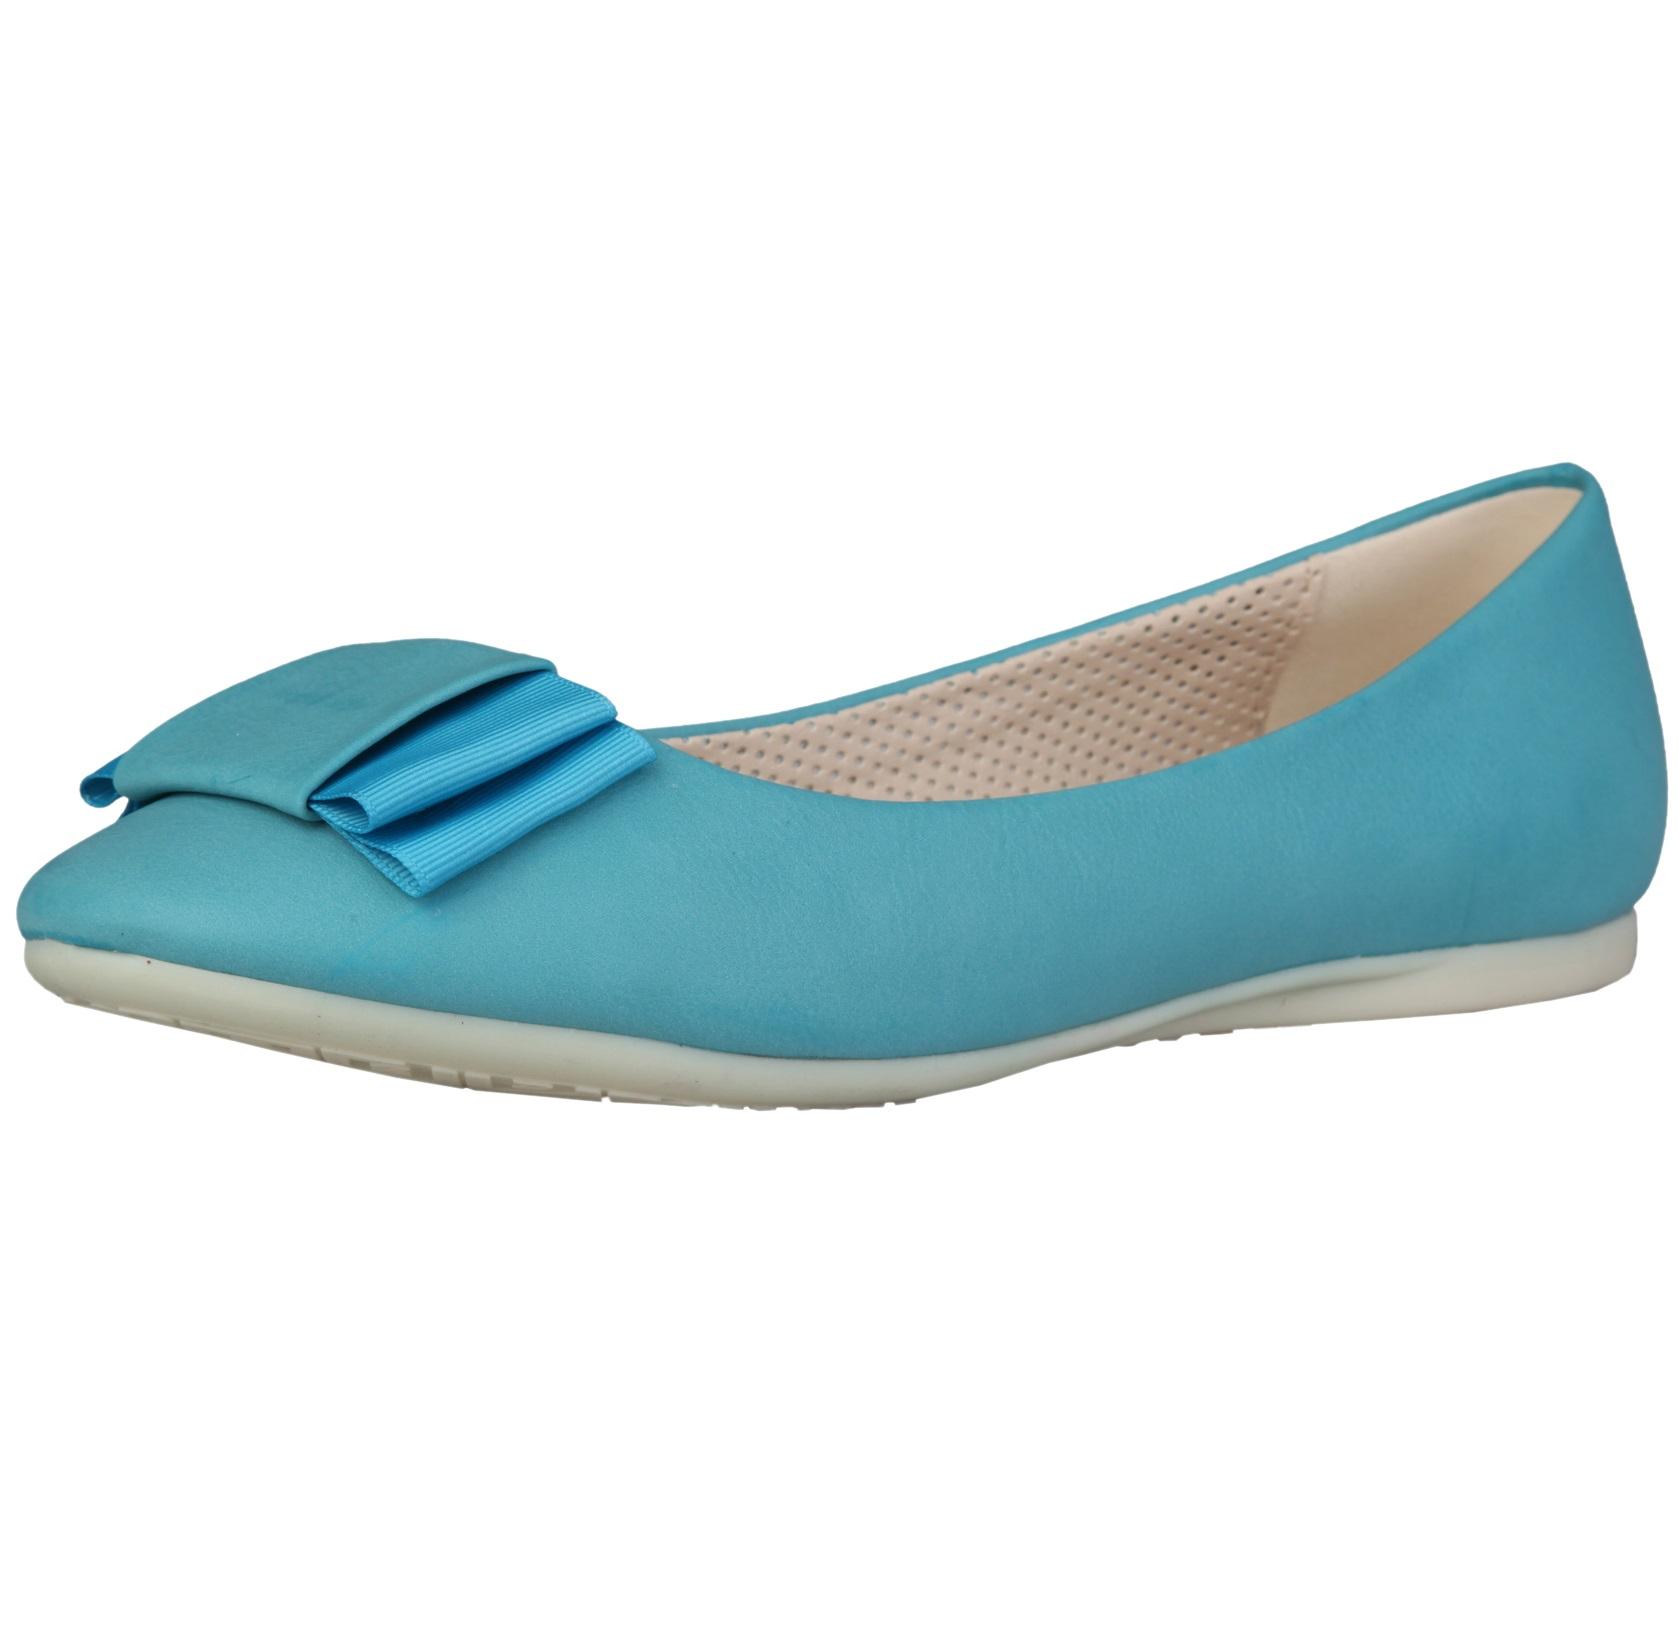 Sofia Loes Flat Shoes Fiocco Bluette Rf600155